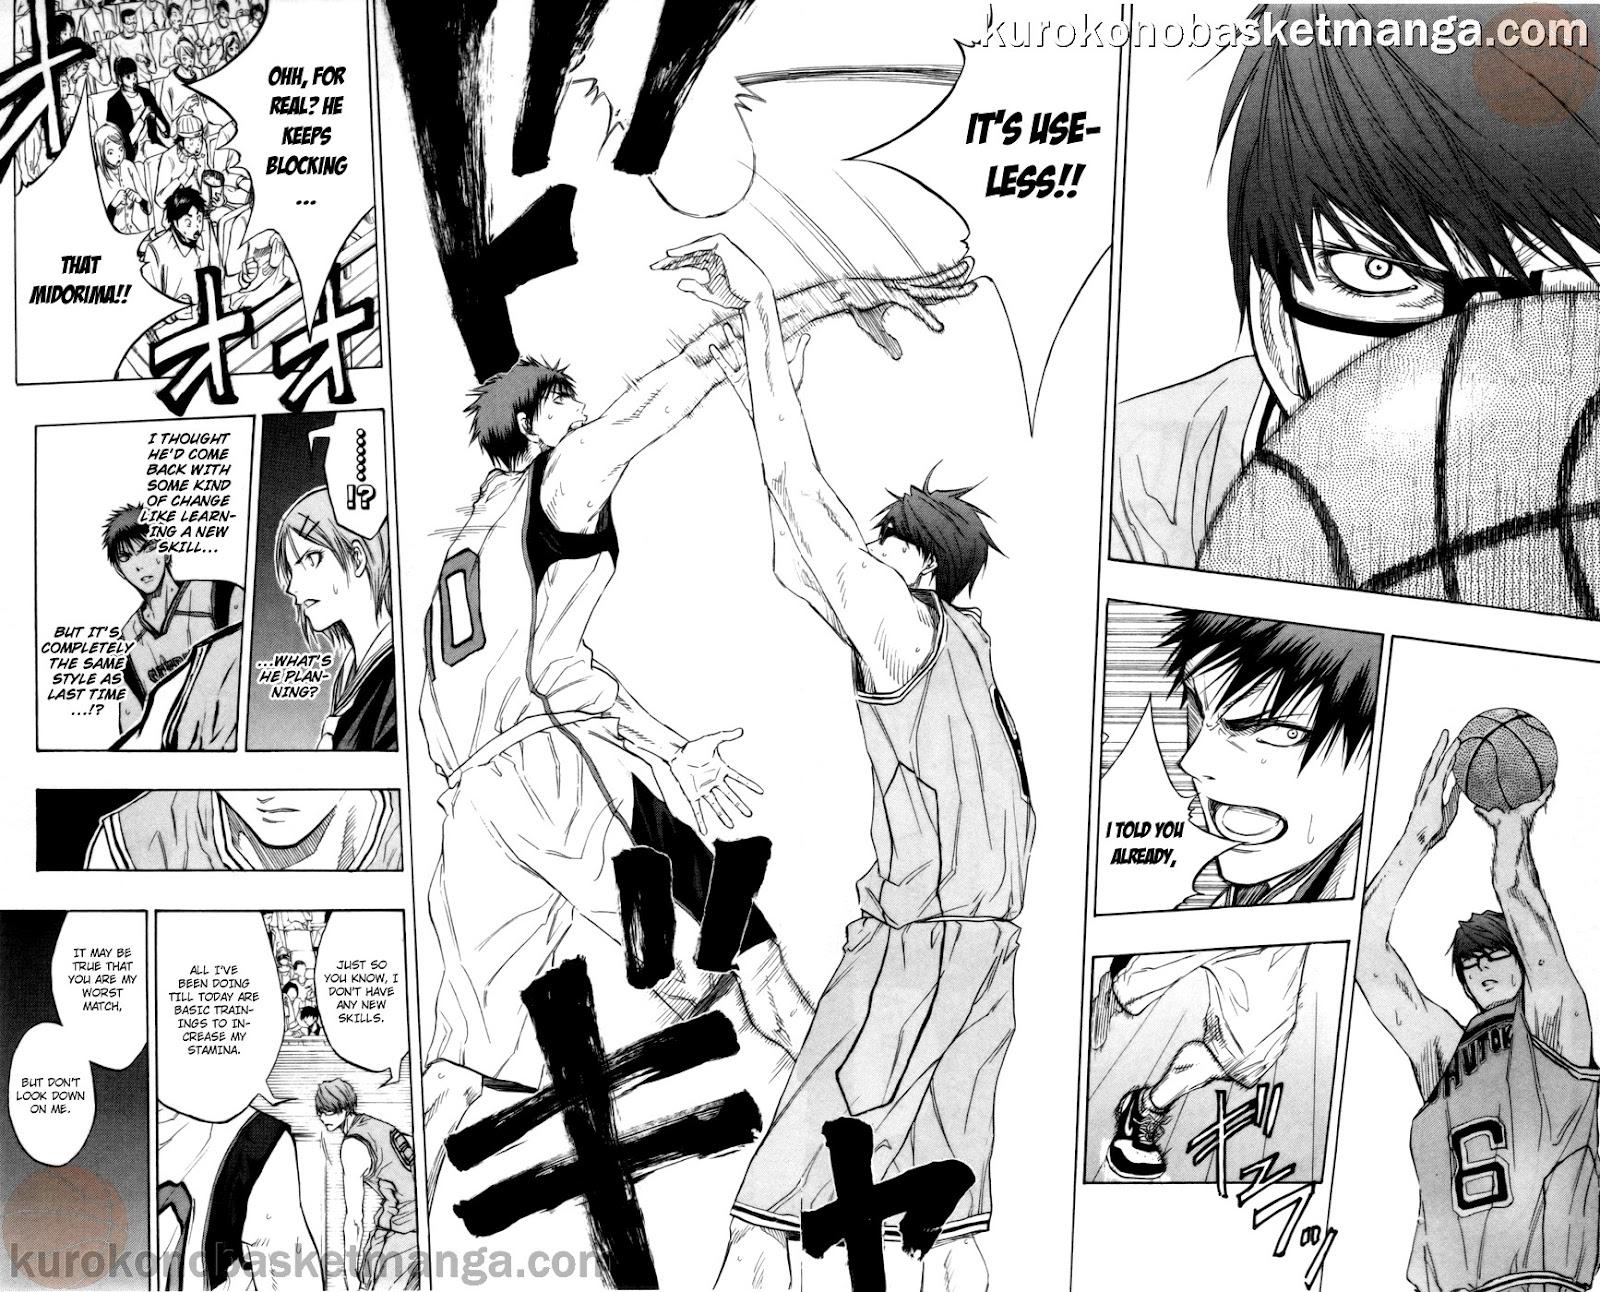 Kuroko no Basket Manga Chapter 86 - Image 16-17